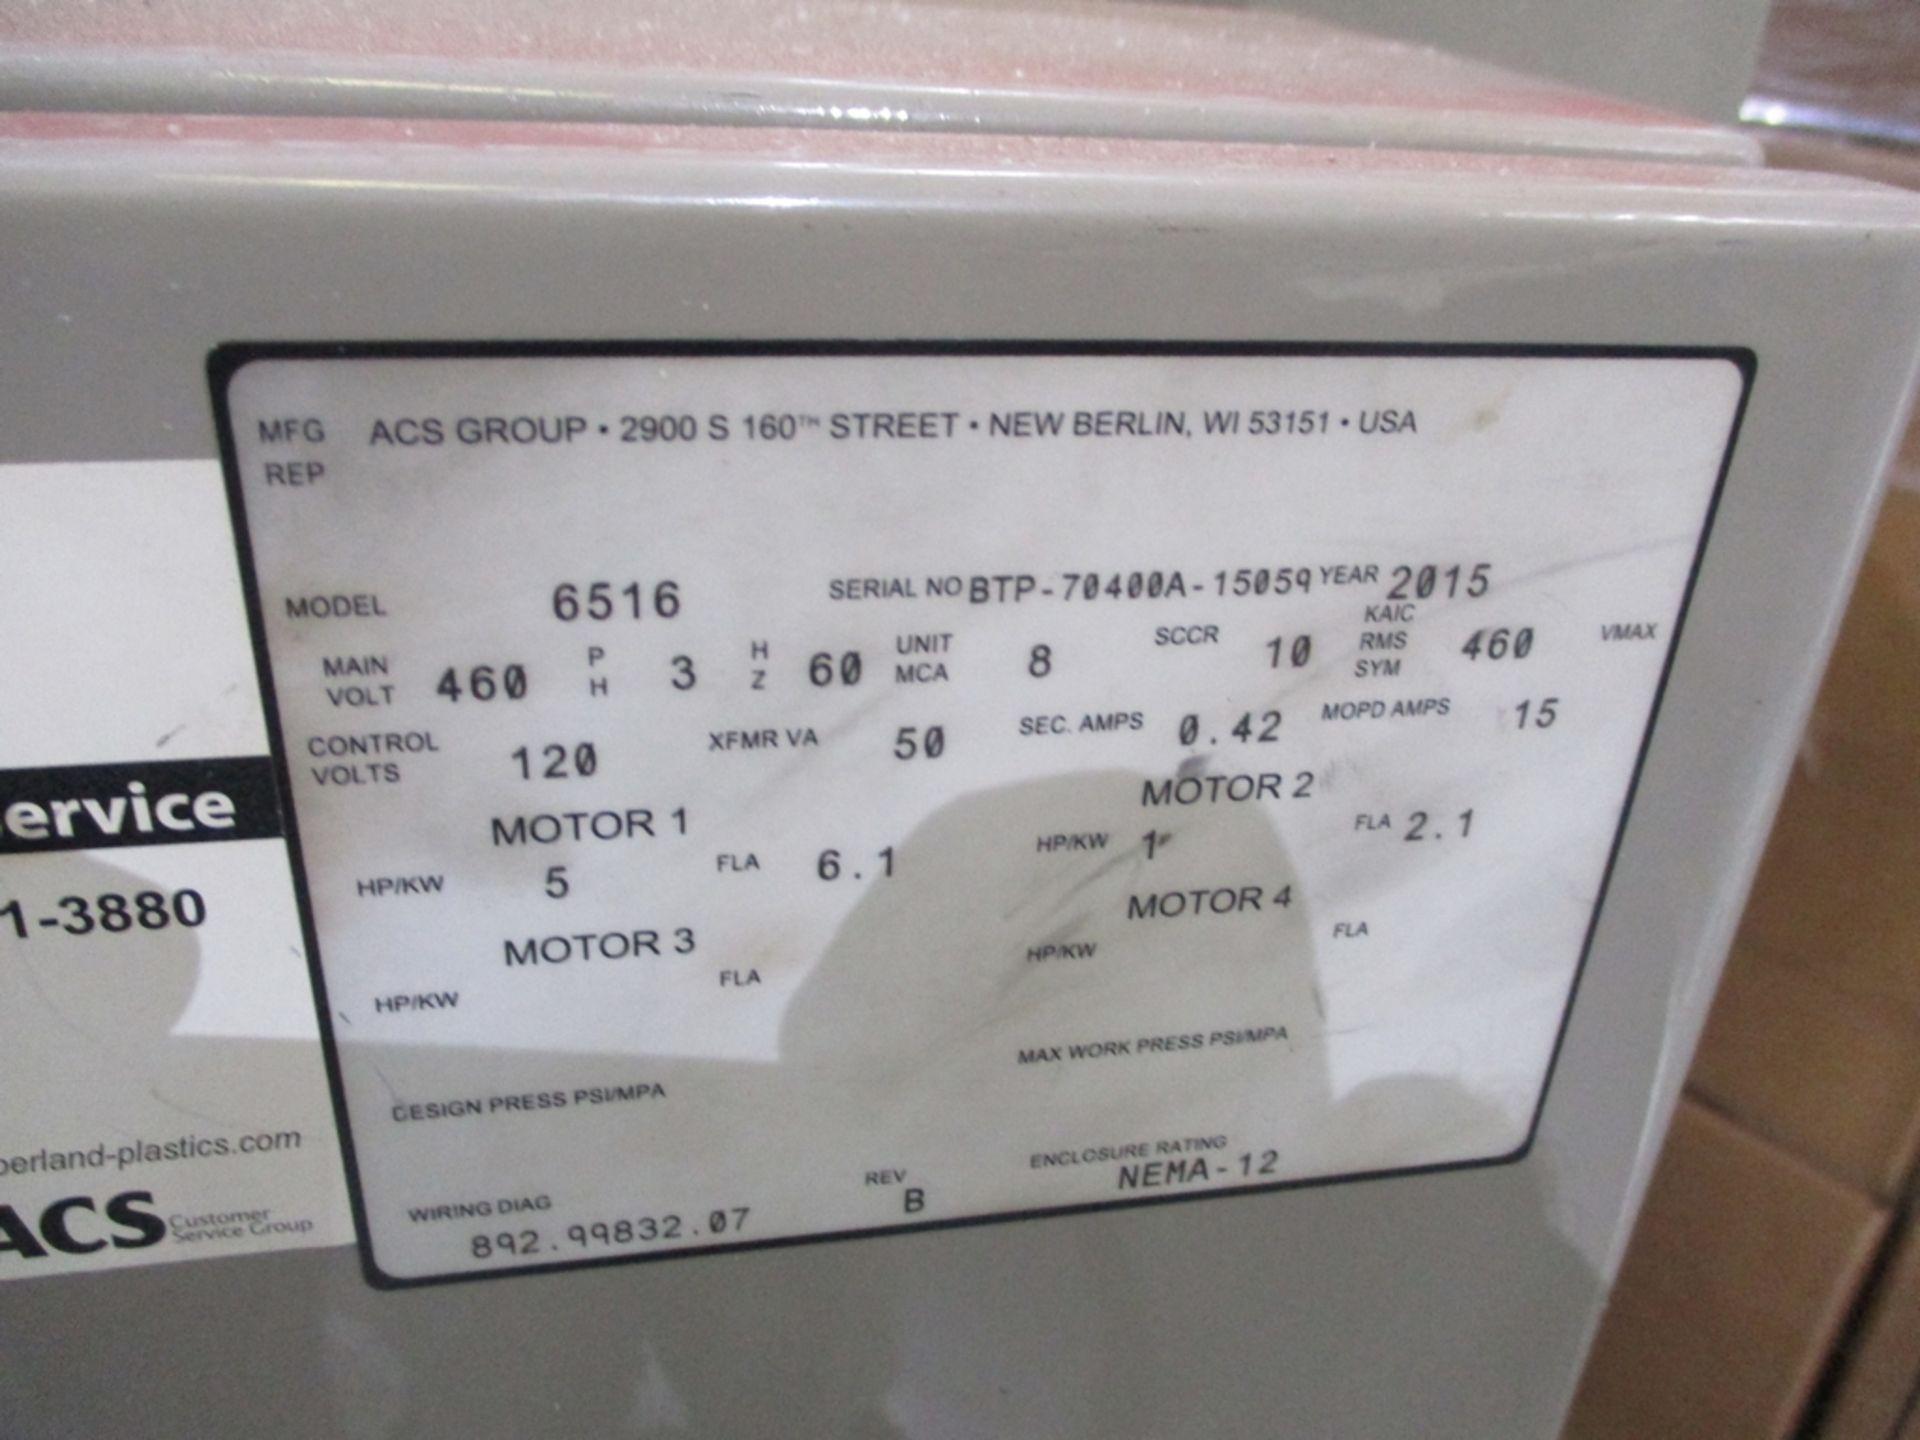 Lot 1015 - 2015 Cumberland 5 HP Scrap Grinder w/ Blower - Model: 6516; Includes Model A24F0 Blower and